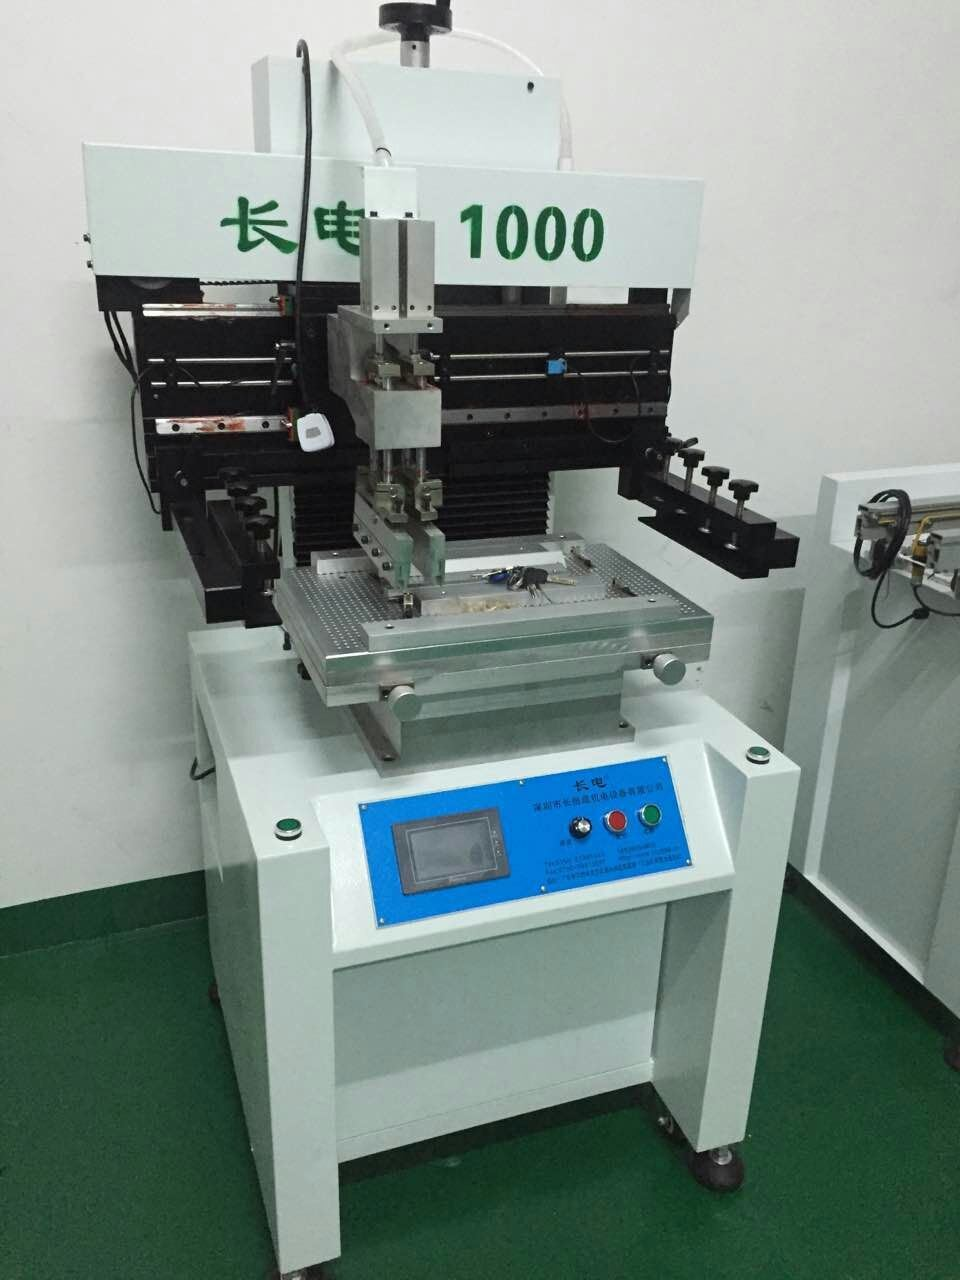 Solder Paste Screen Printer PCB Assembly Machine SMT Manual Printing